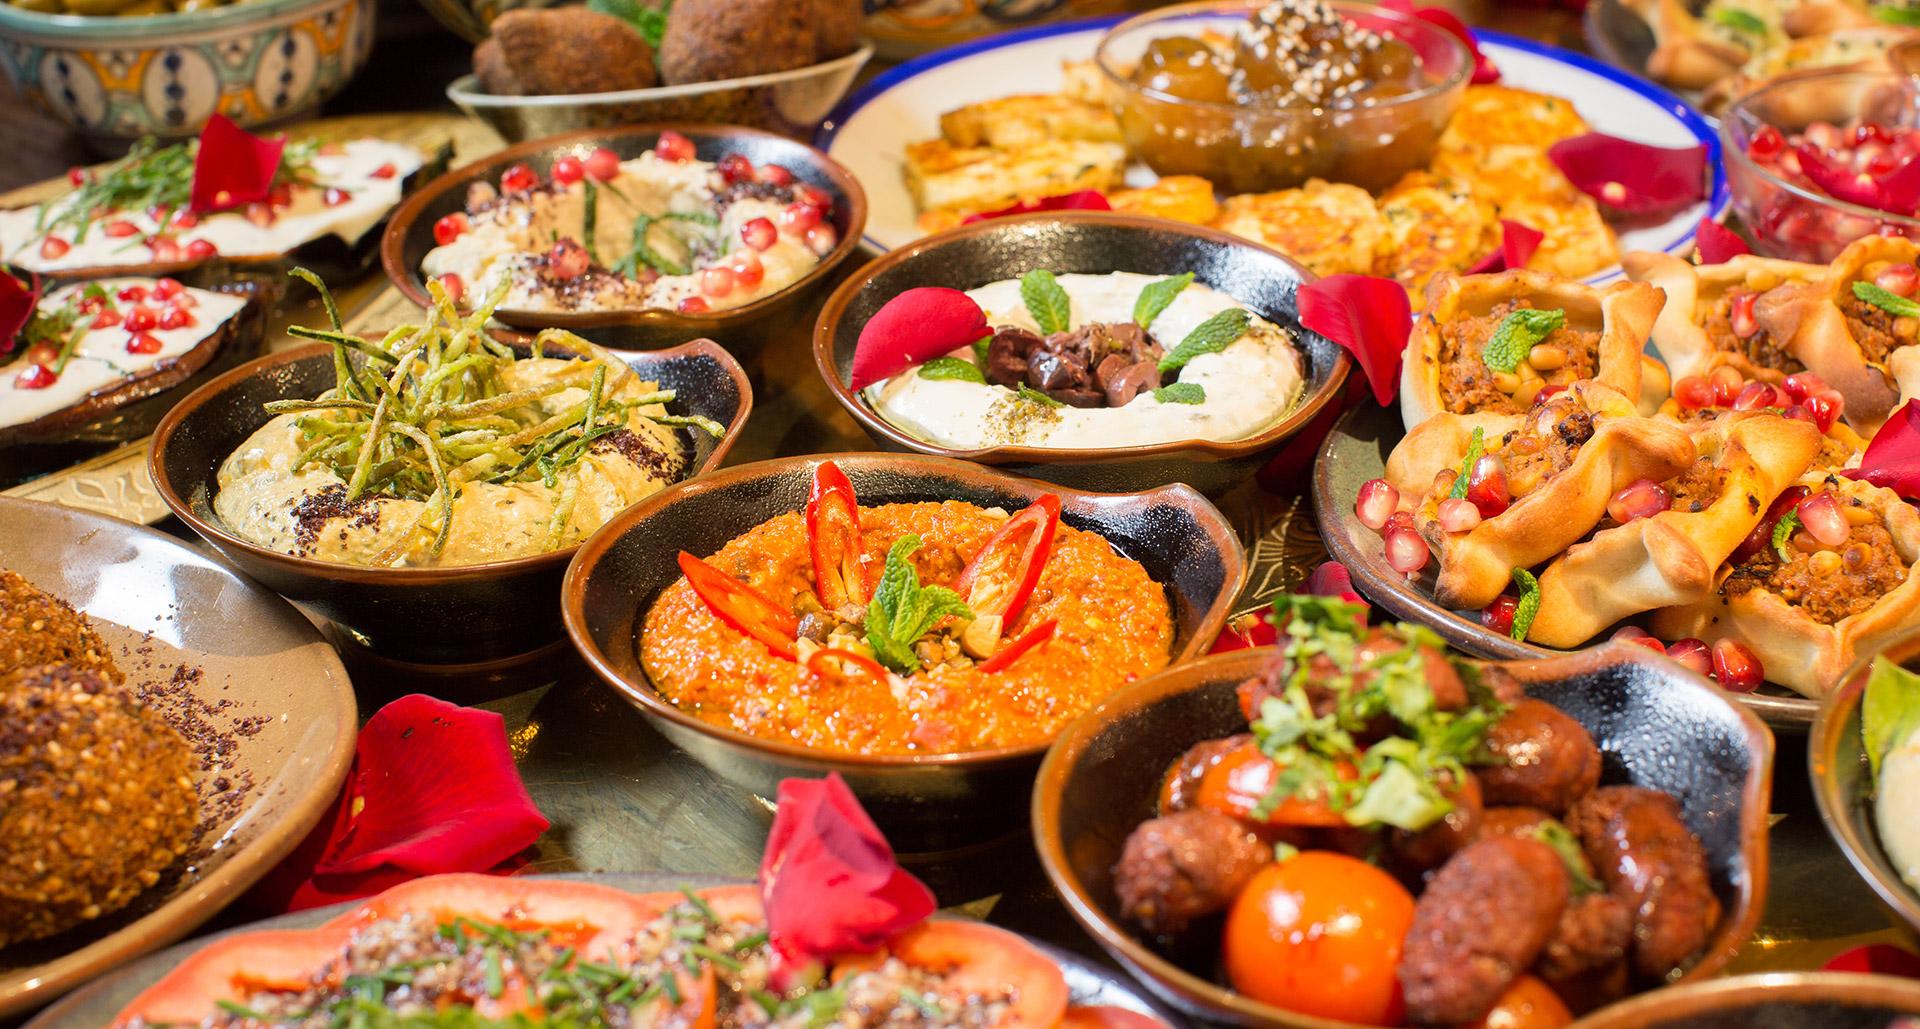 Levant Restaurant - Lebanese Restaurant in Oxford Circus